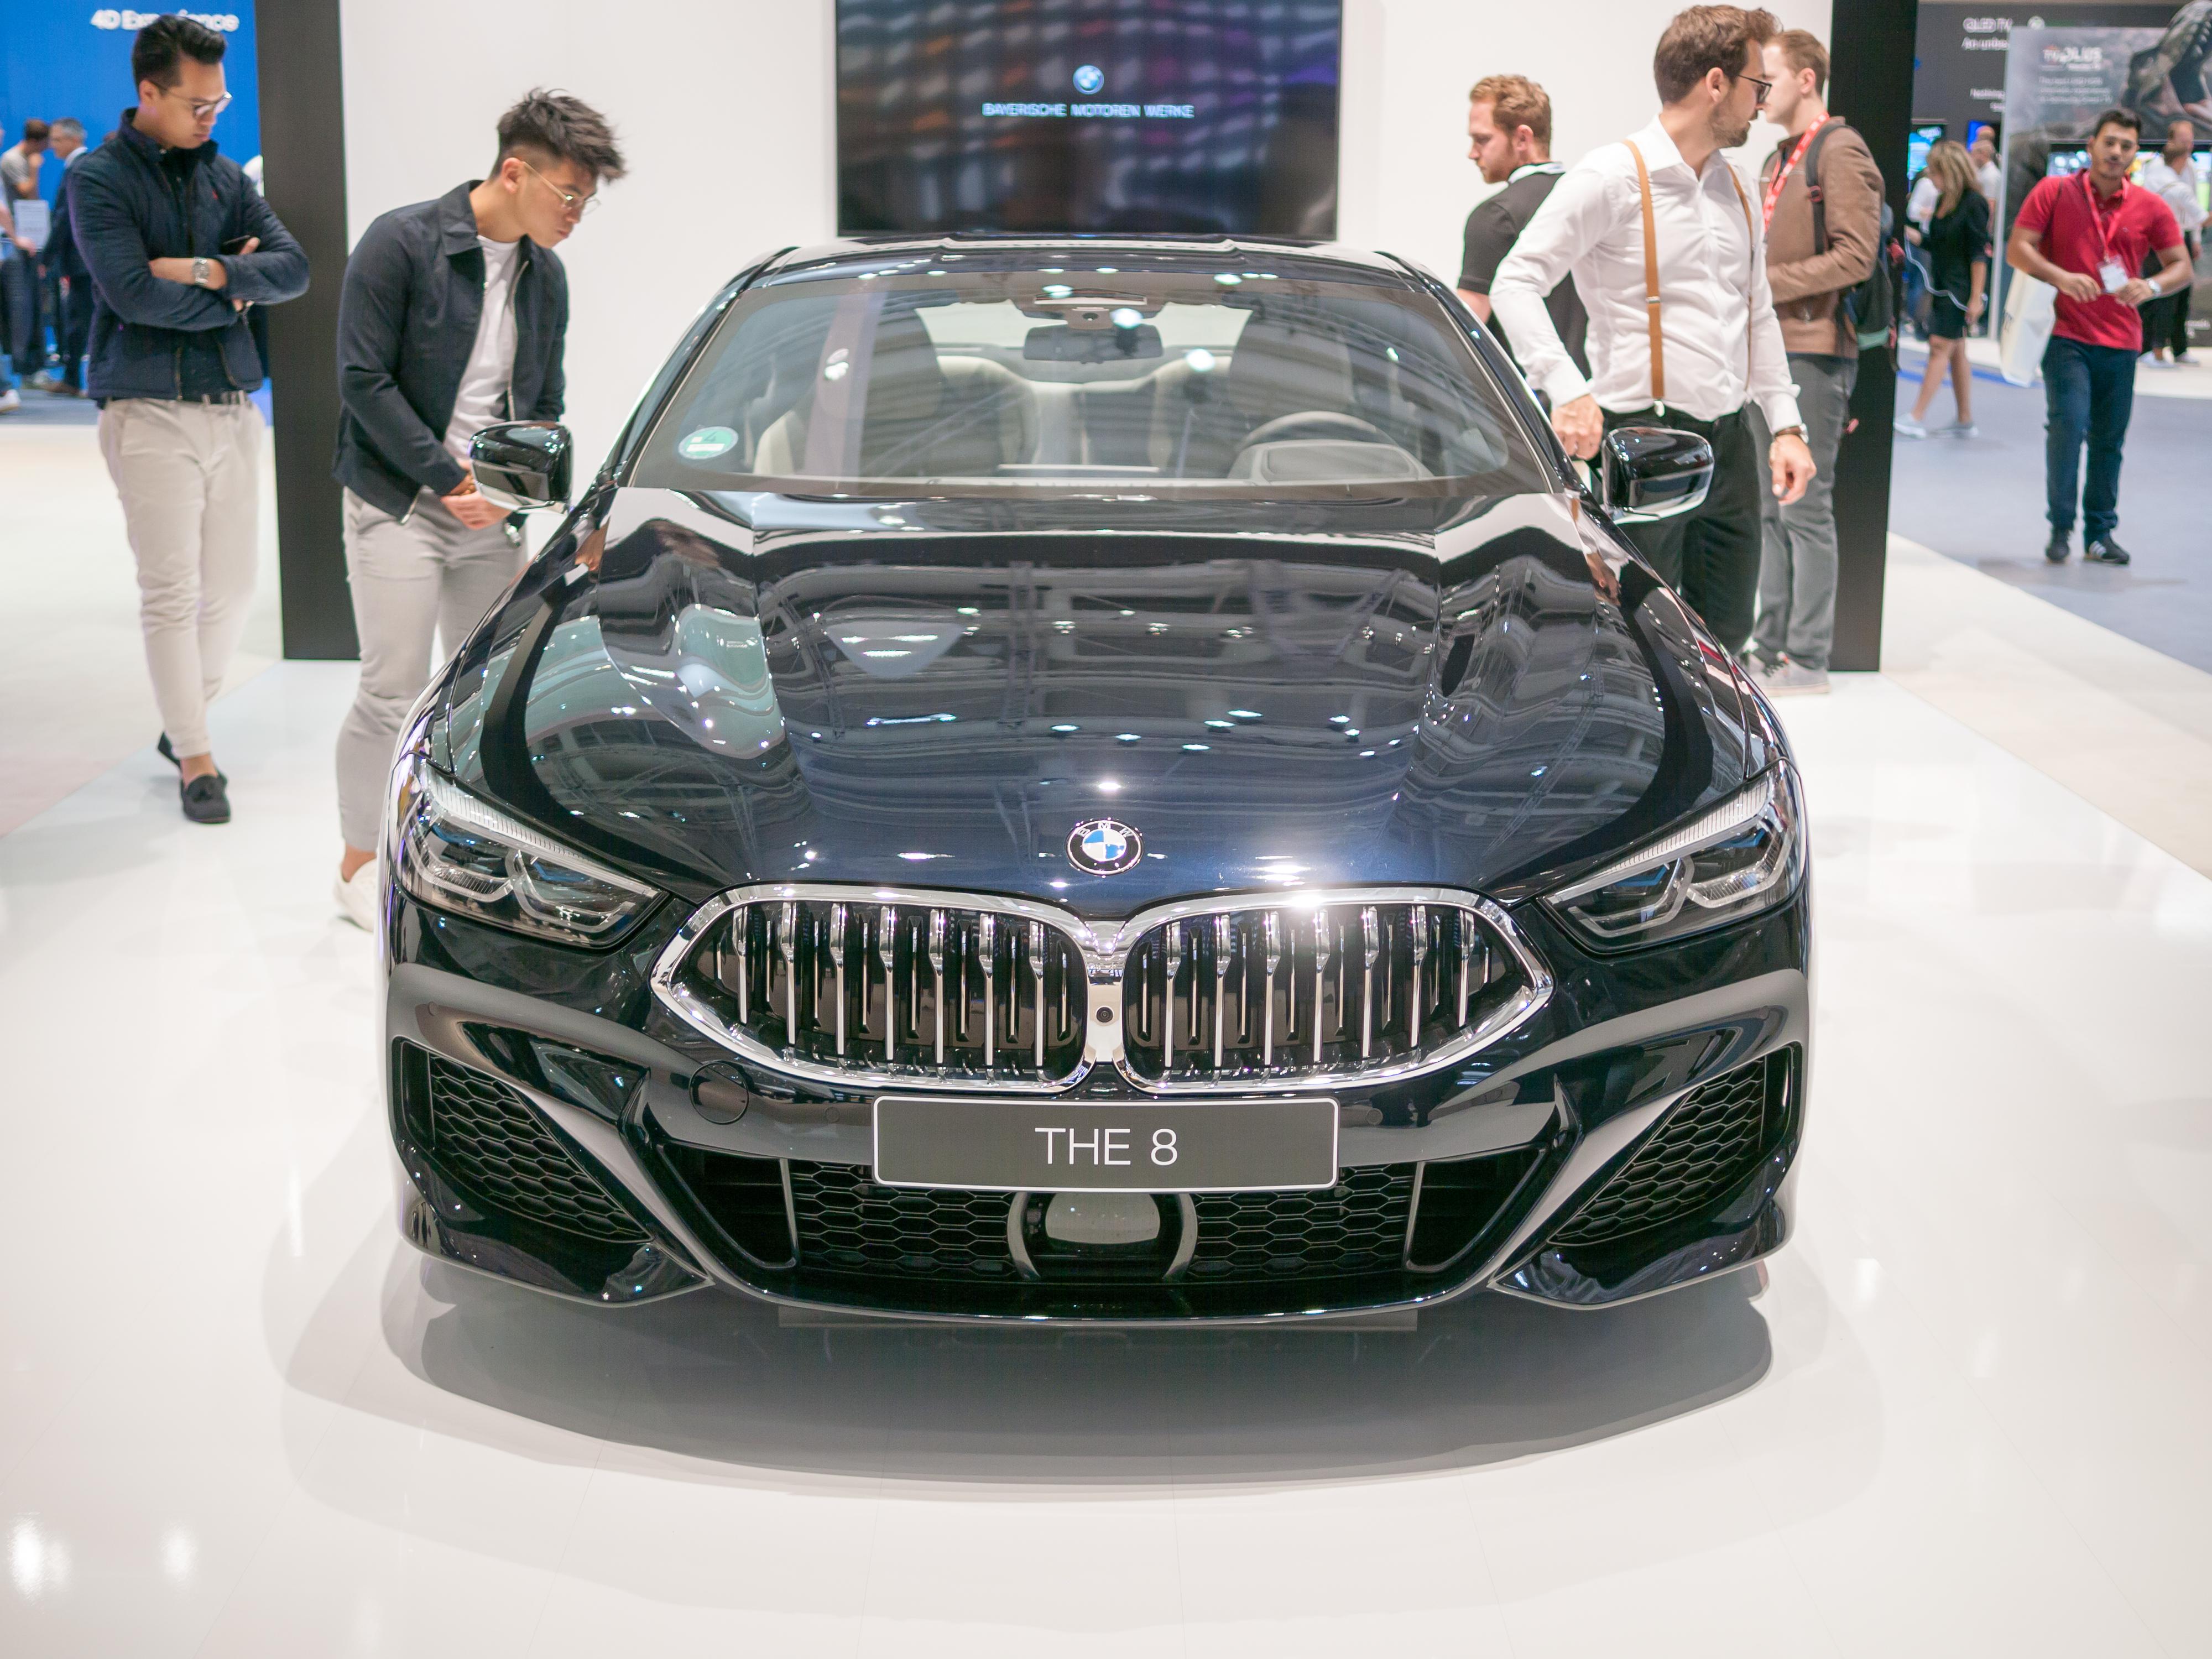 565beca4e0a6ff File:BMW 840d, IFA 2018, Berlin (P1070296).jpg - Wikimedia Commons